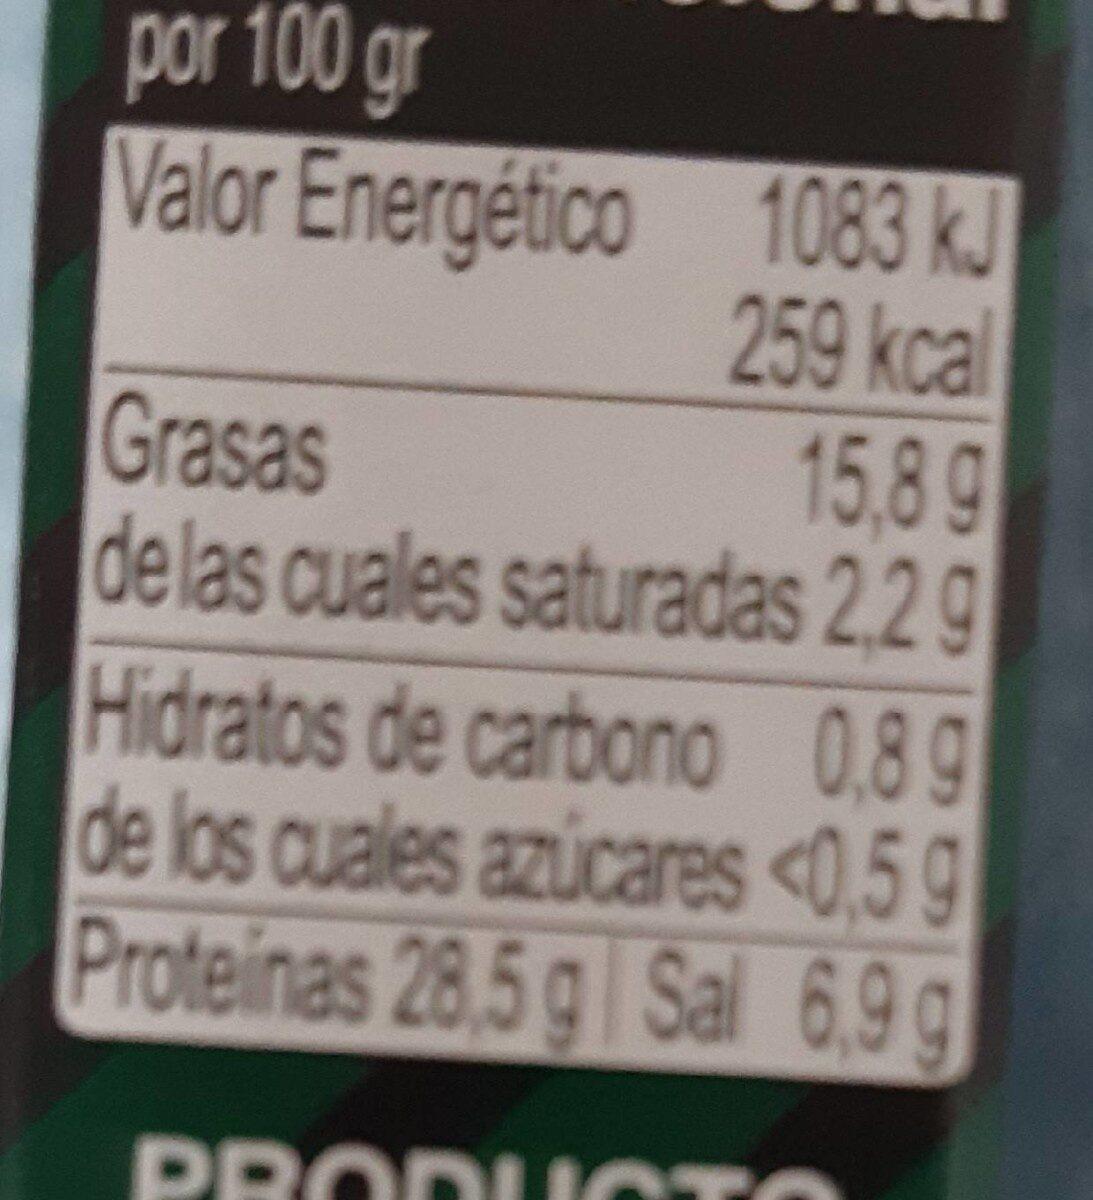 Filetes de anchoas - Nutrition facts - es